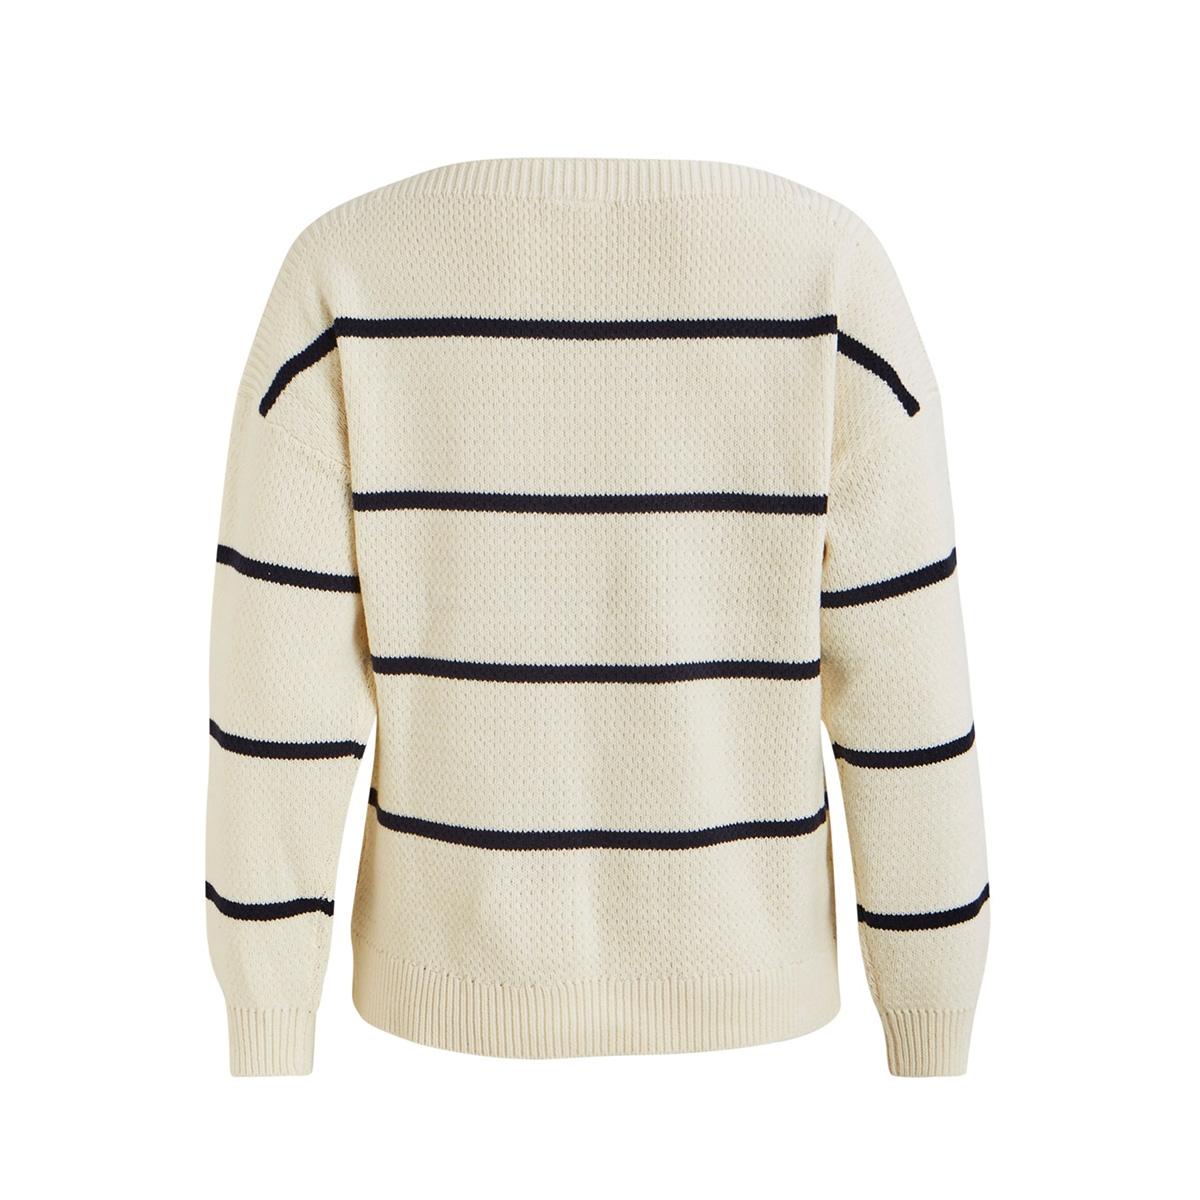 visunset knit ls top/ki 14055452 vila trui white alyssum/w. navy blazer